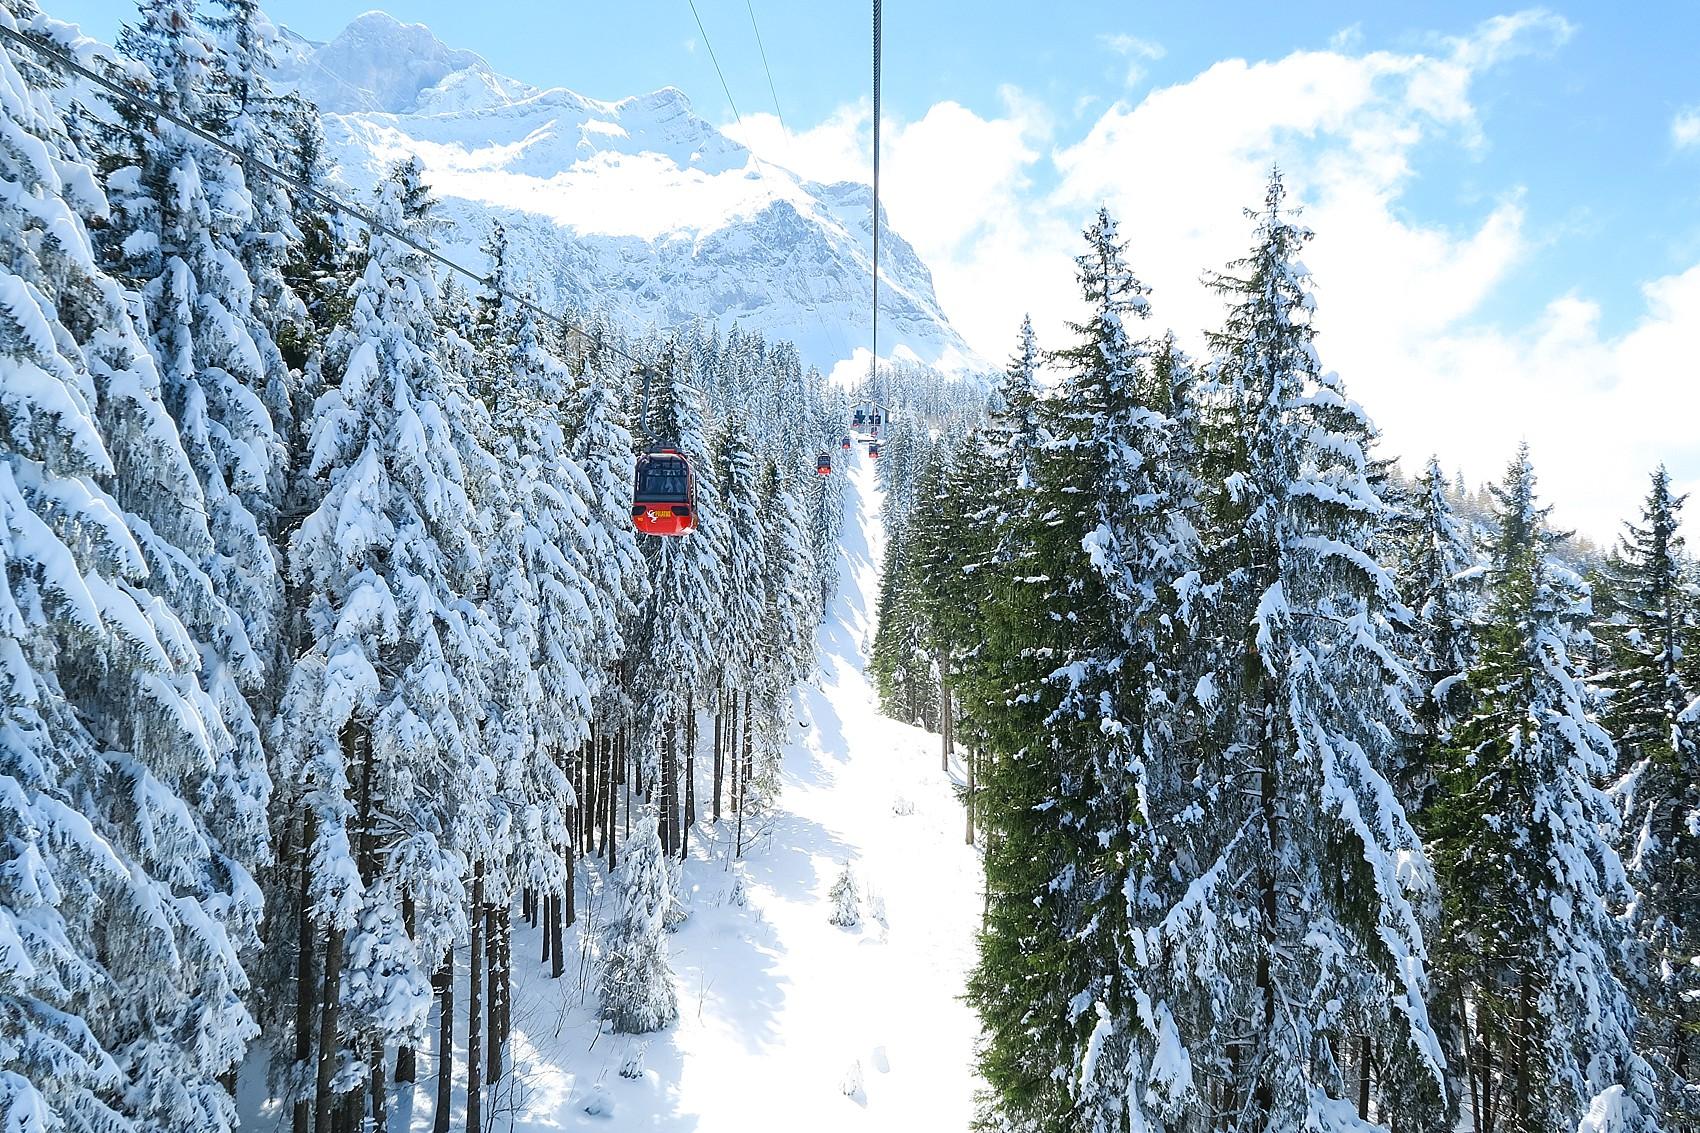 Lucerne Switzerland Travel tips Mount Pilatus